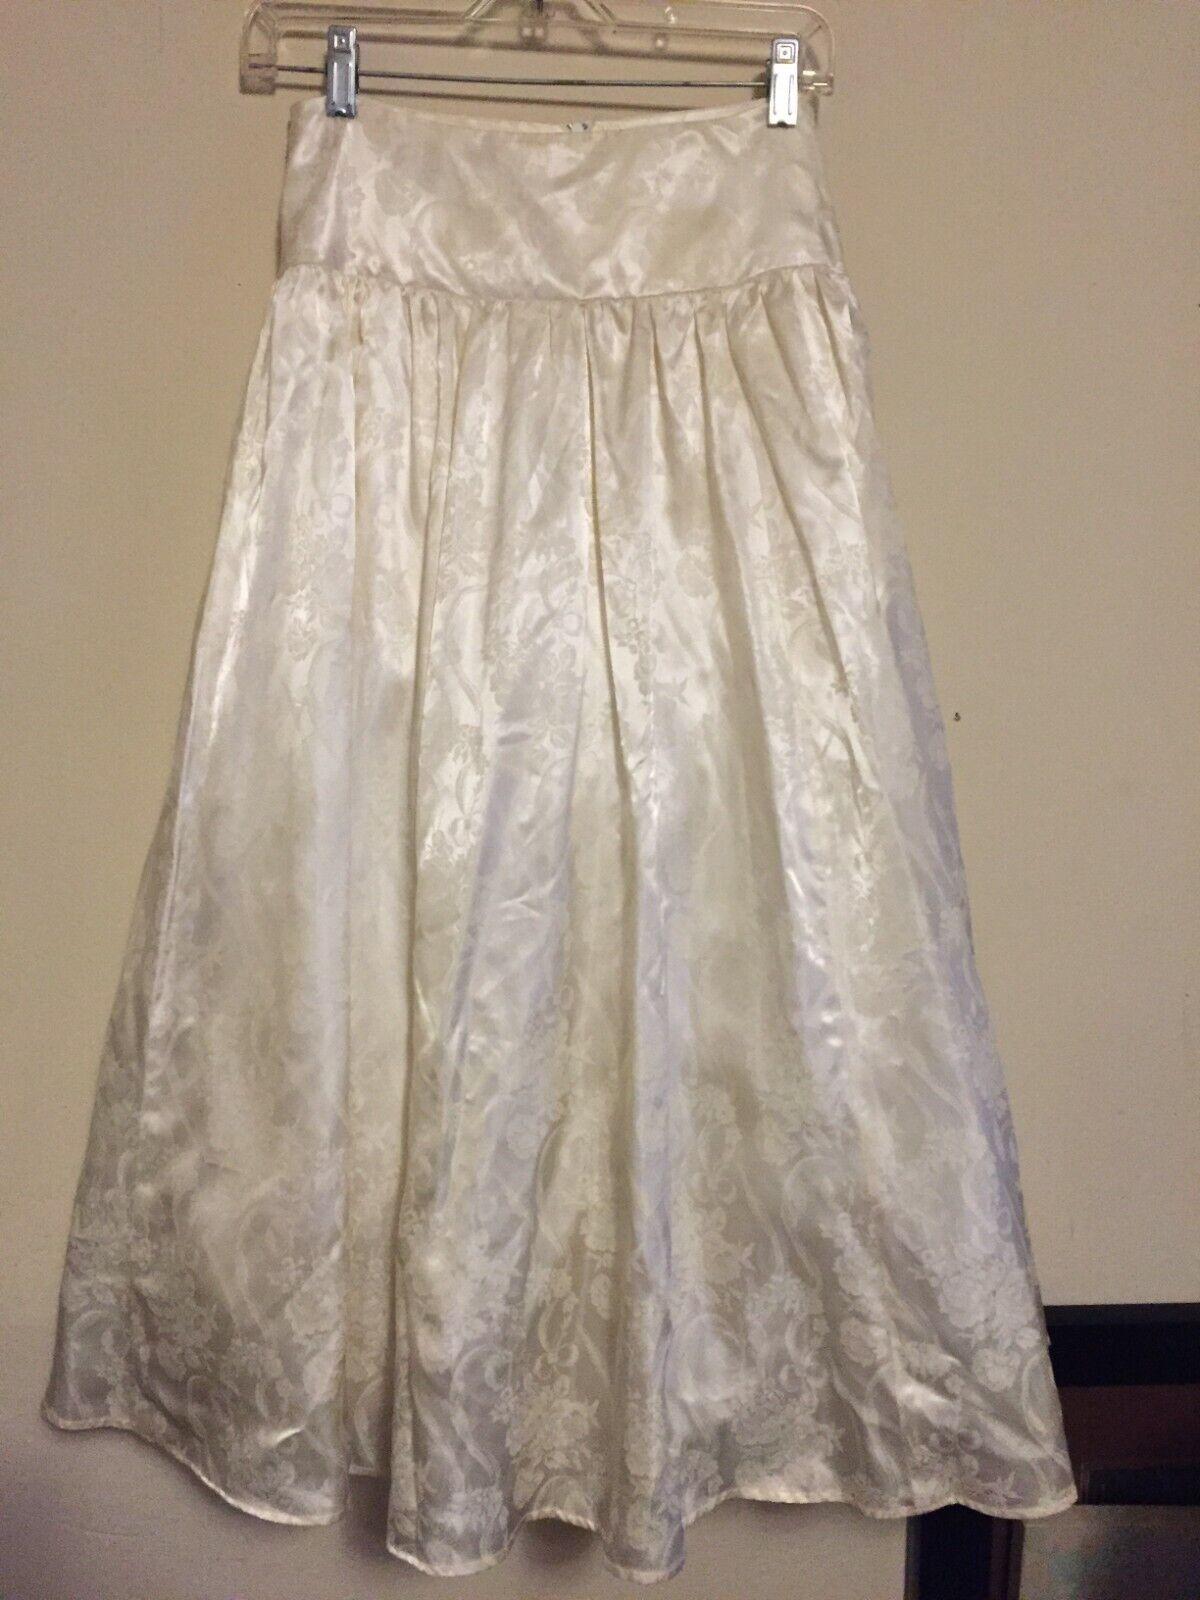 VINTAGE Jessica McClintock Crinoline Skirt 80s - image 1